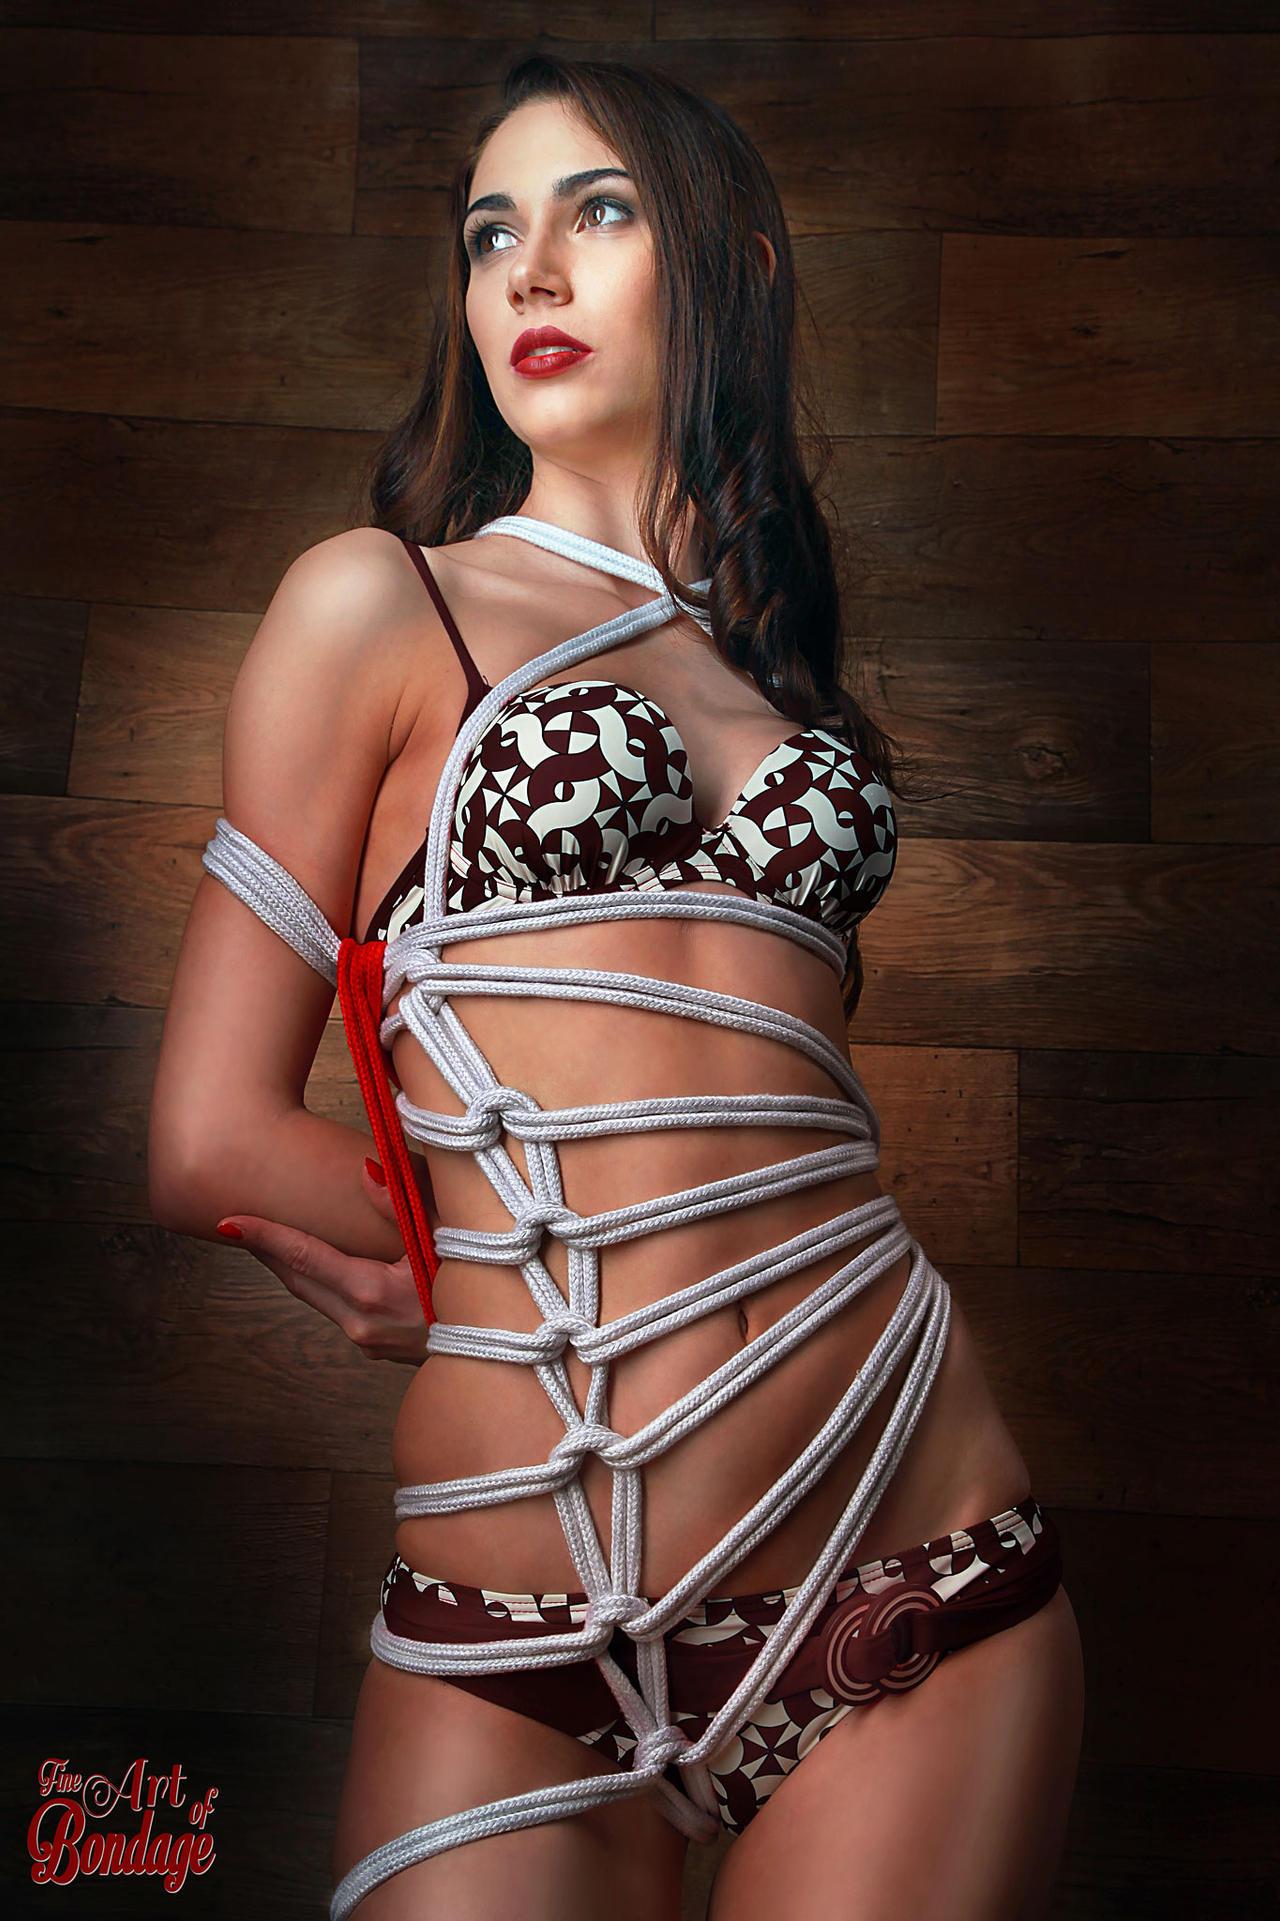 Bikini Bondage - Fine Art of Bondage